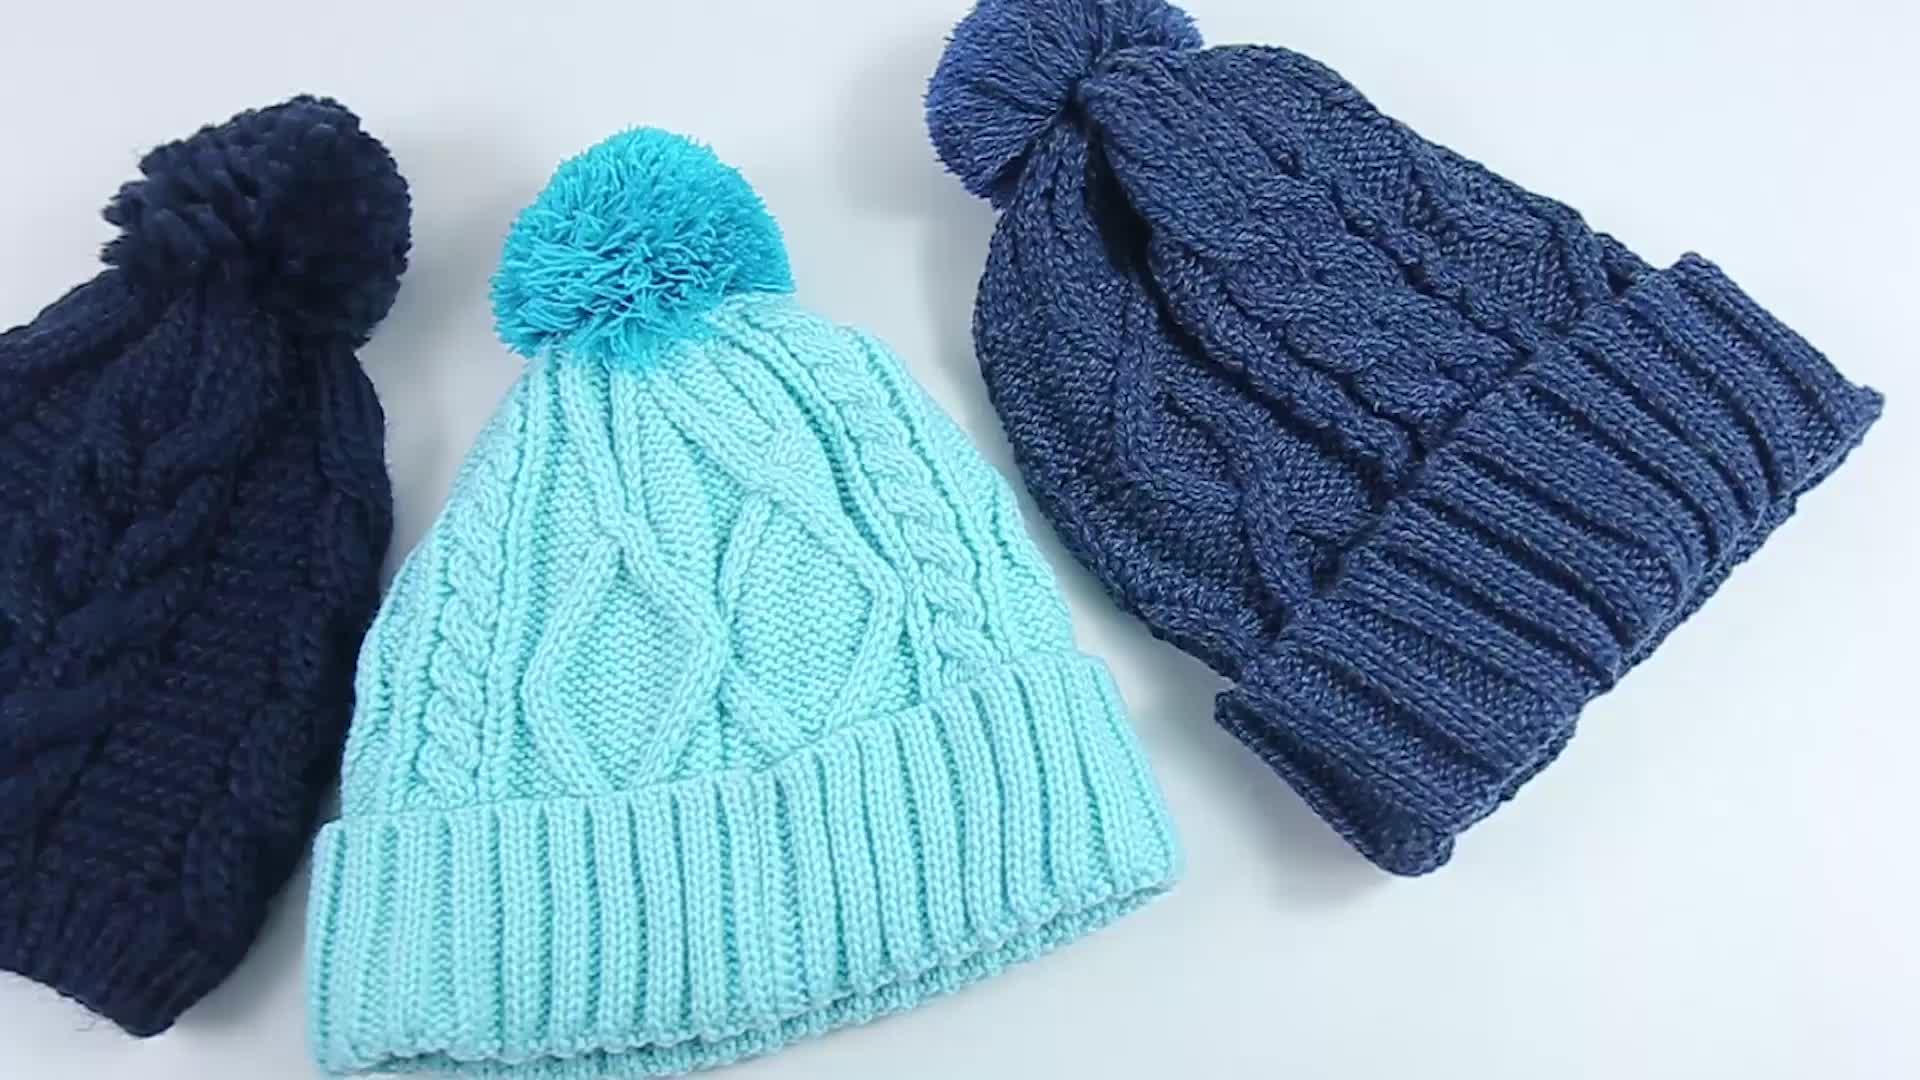 Design your own custom 100% Acrylic sport beanie cap wholesale men knit hat with Pom Pom